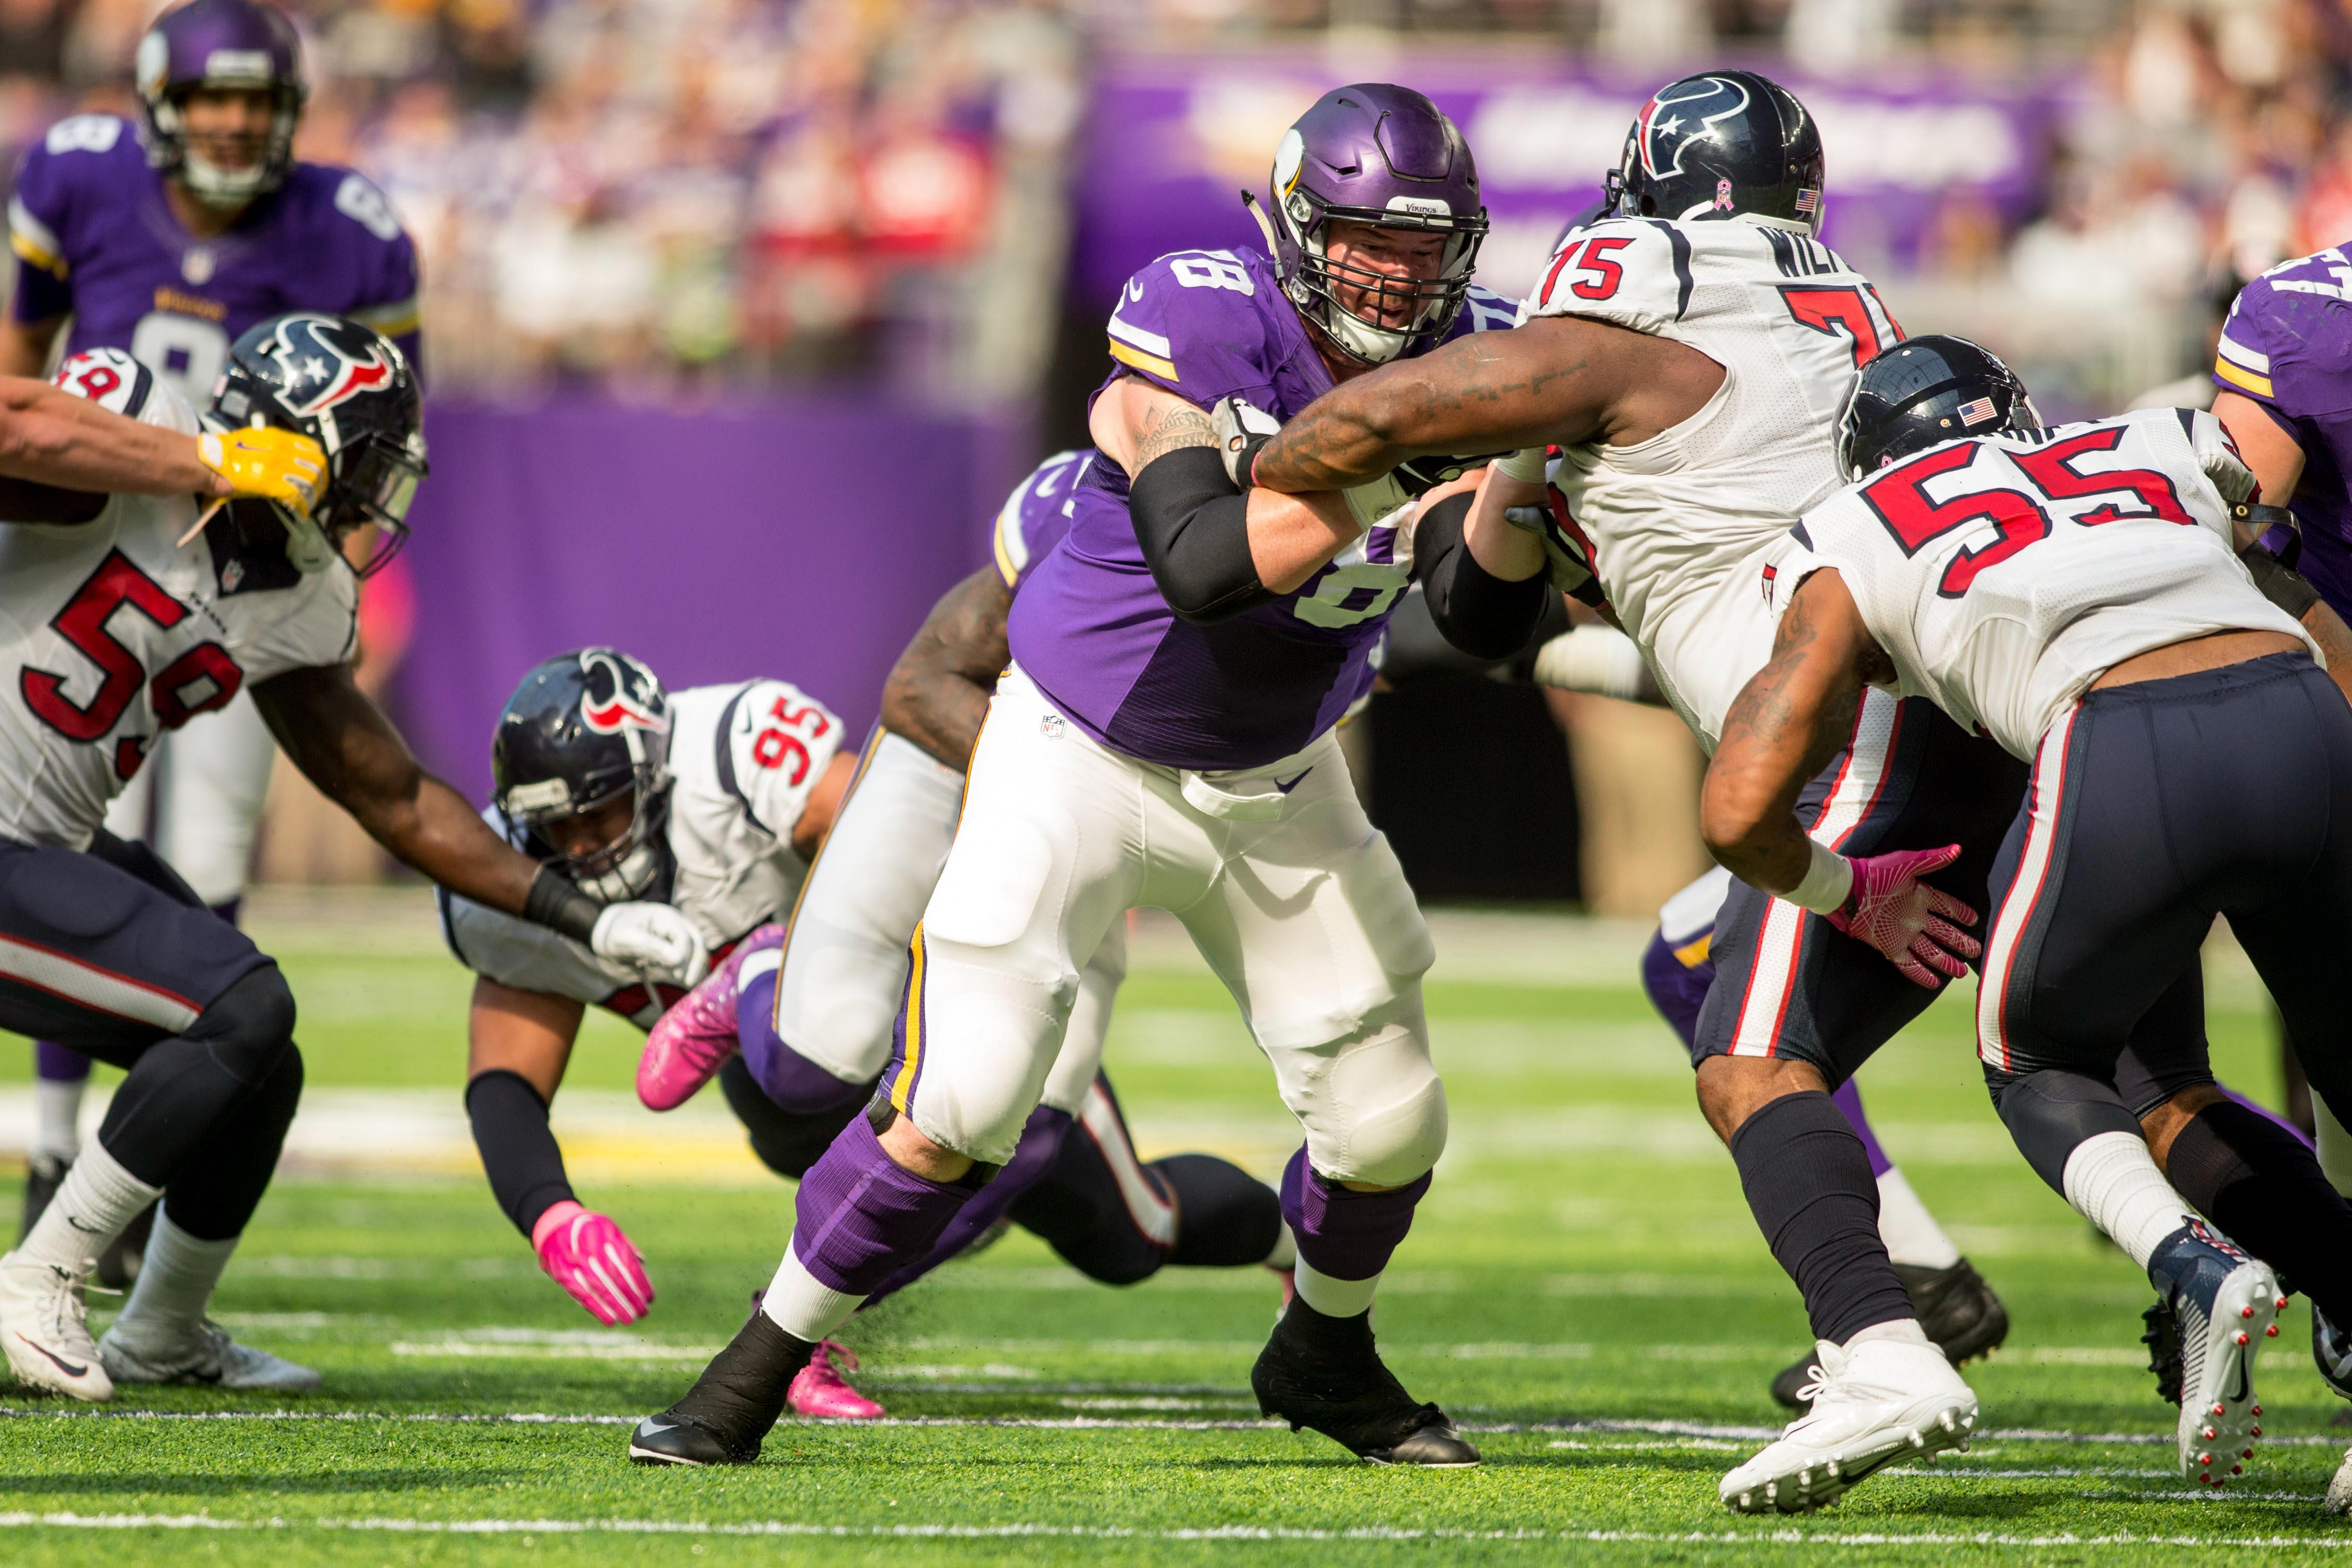 NFL: Houston Texans at Minnesota Vikings